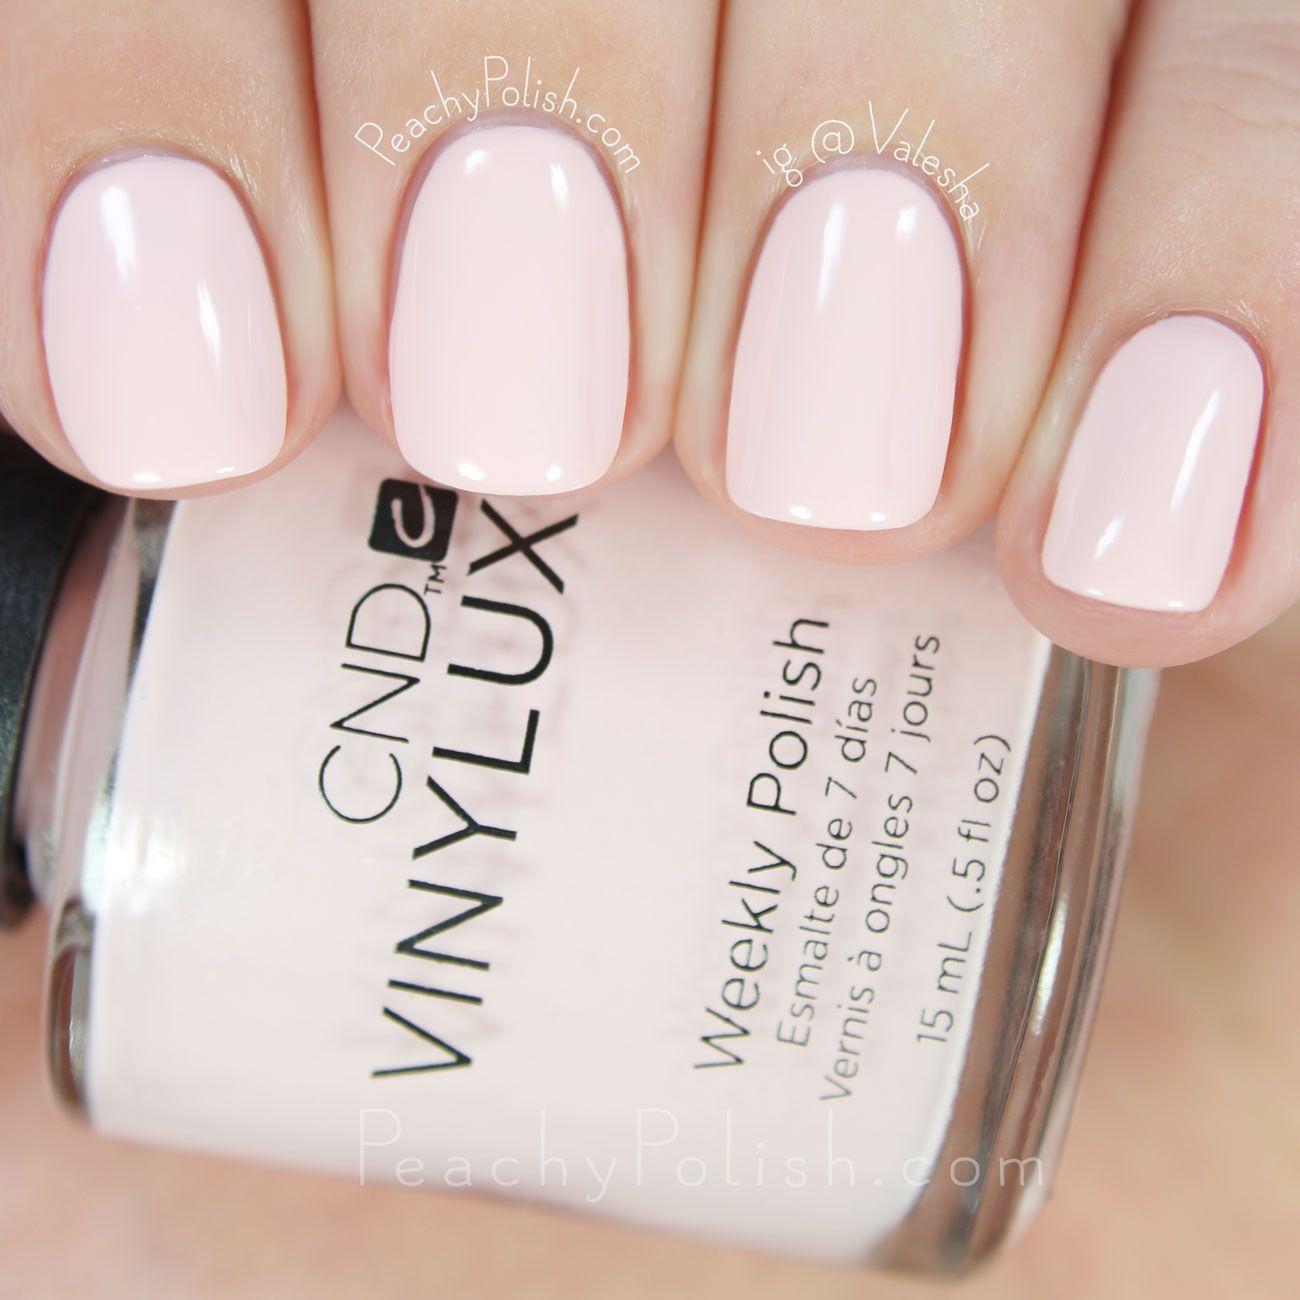 Cnd Vinylux Winter Glow Winter 2015 Aurora Collection Peachy Polish Nails Cnd Vinylux